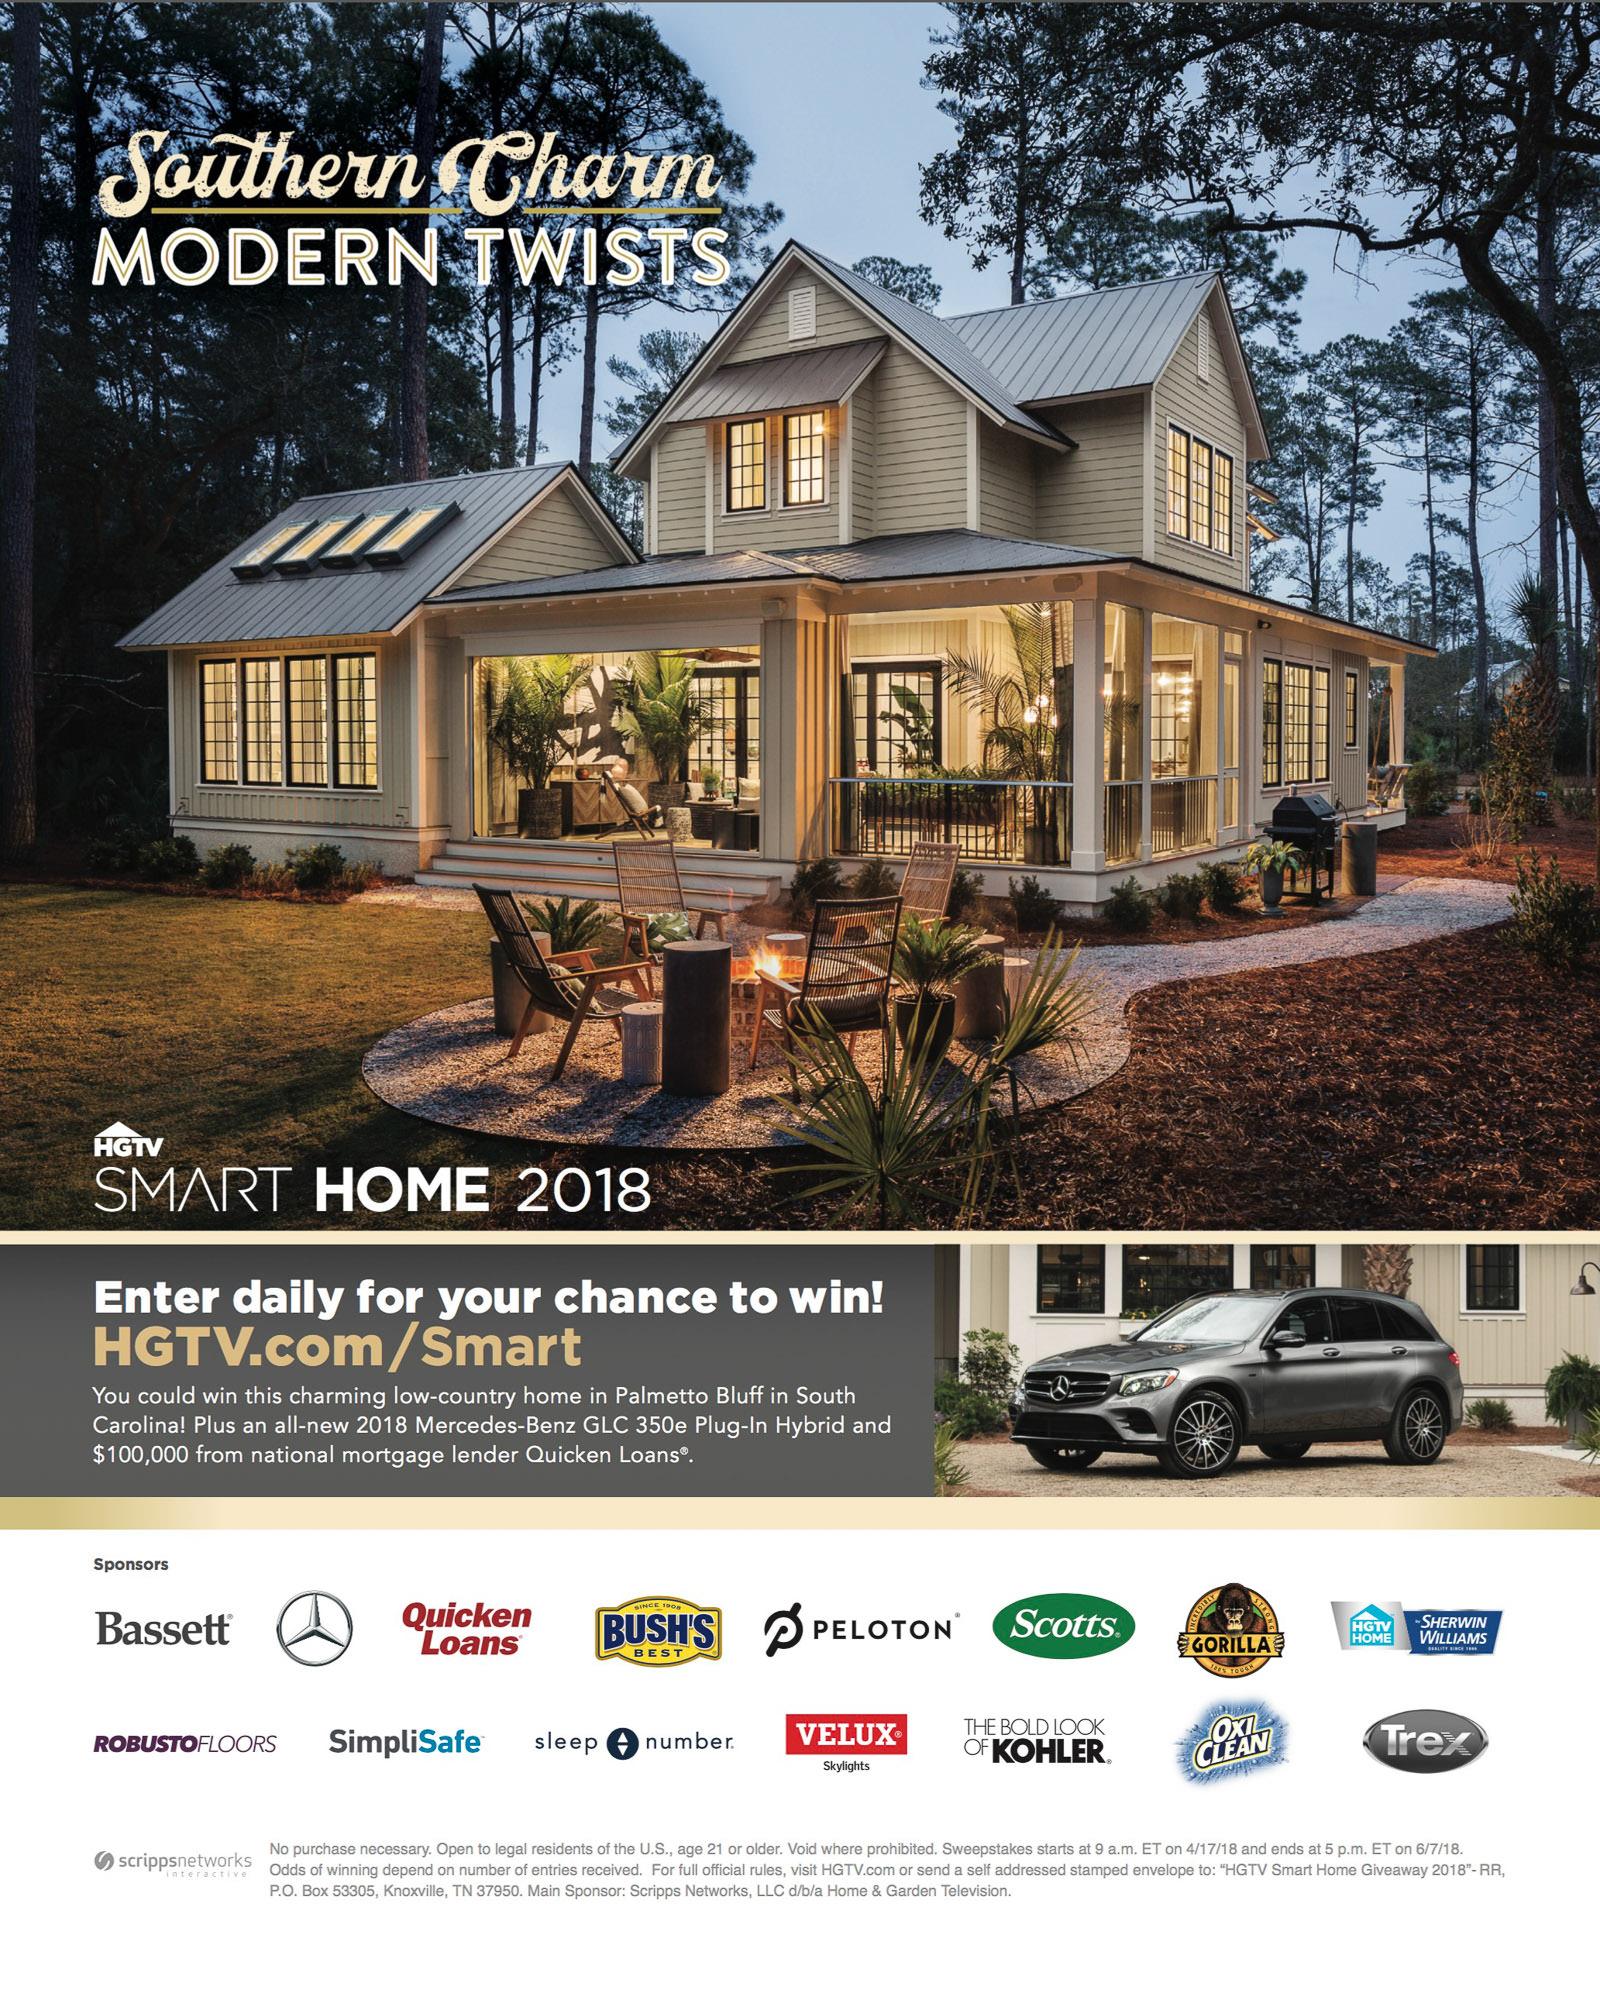 HGTV: Smart Home 2018